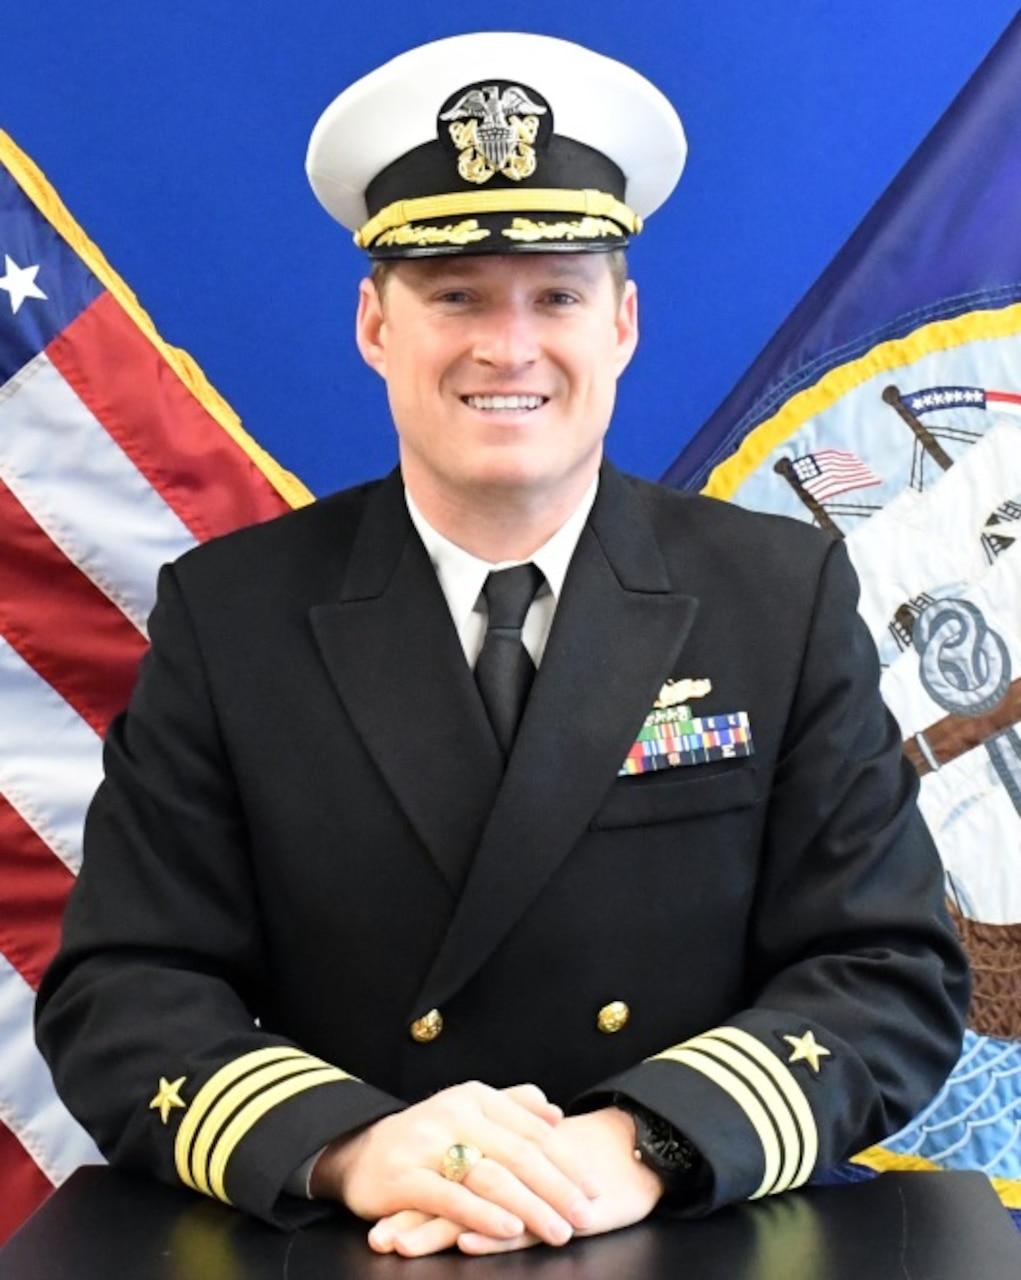 Commander Spike Lamson